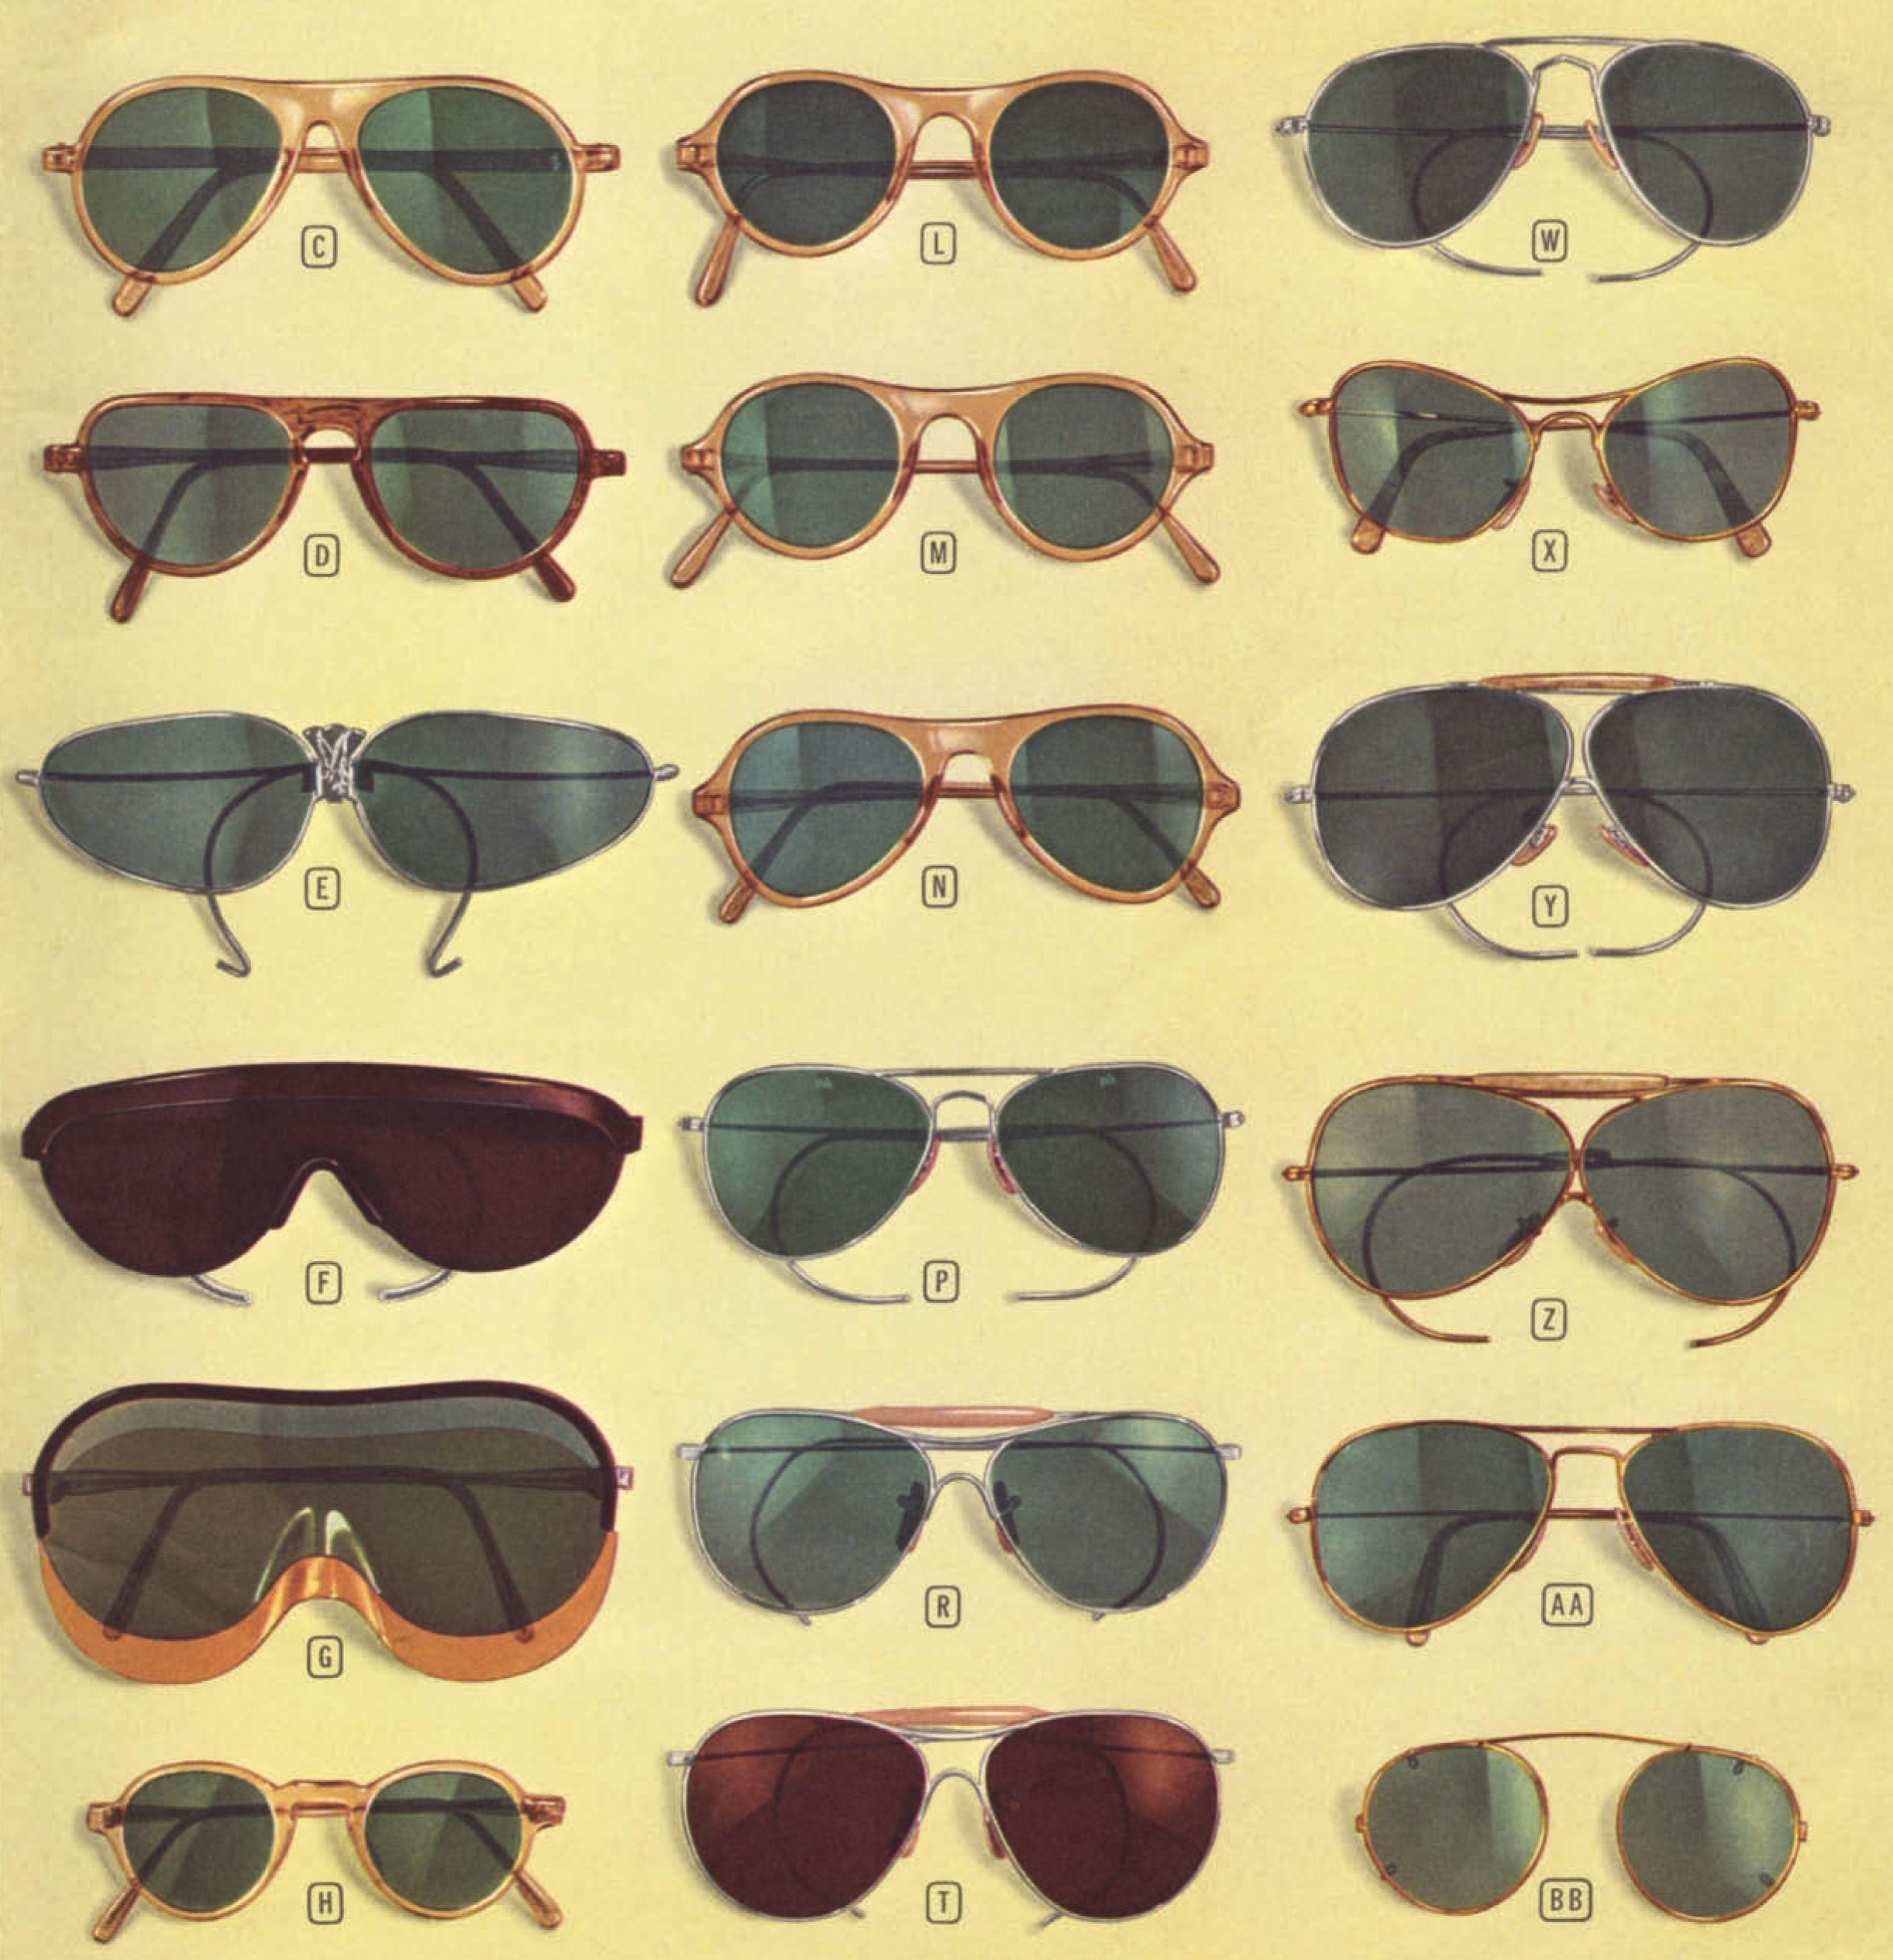 812fdc9054 Montgomery Ward catalogue 1946. Sunglasses Shop